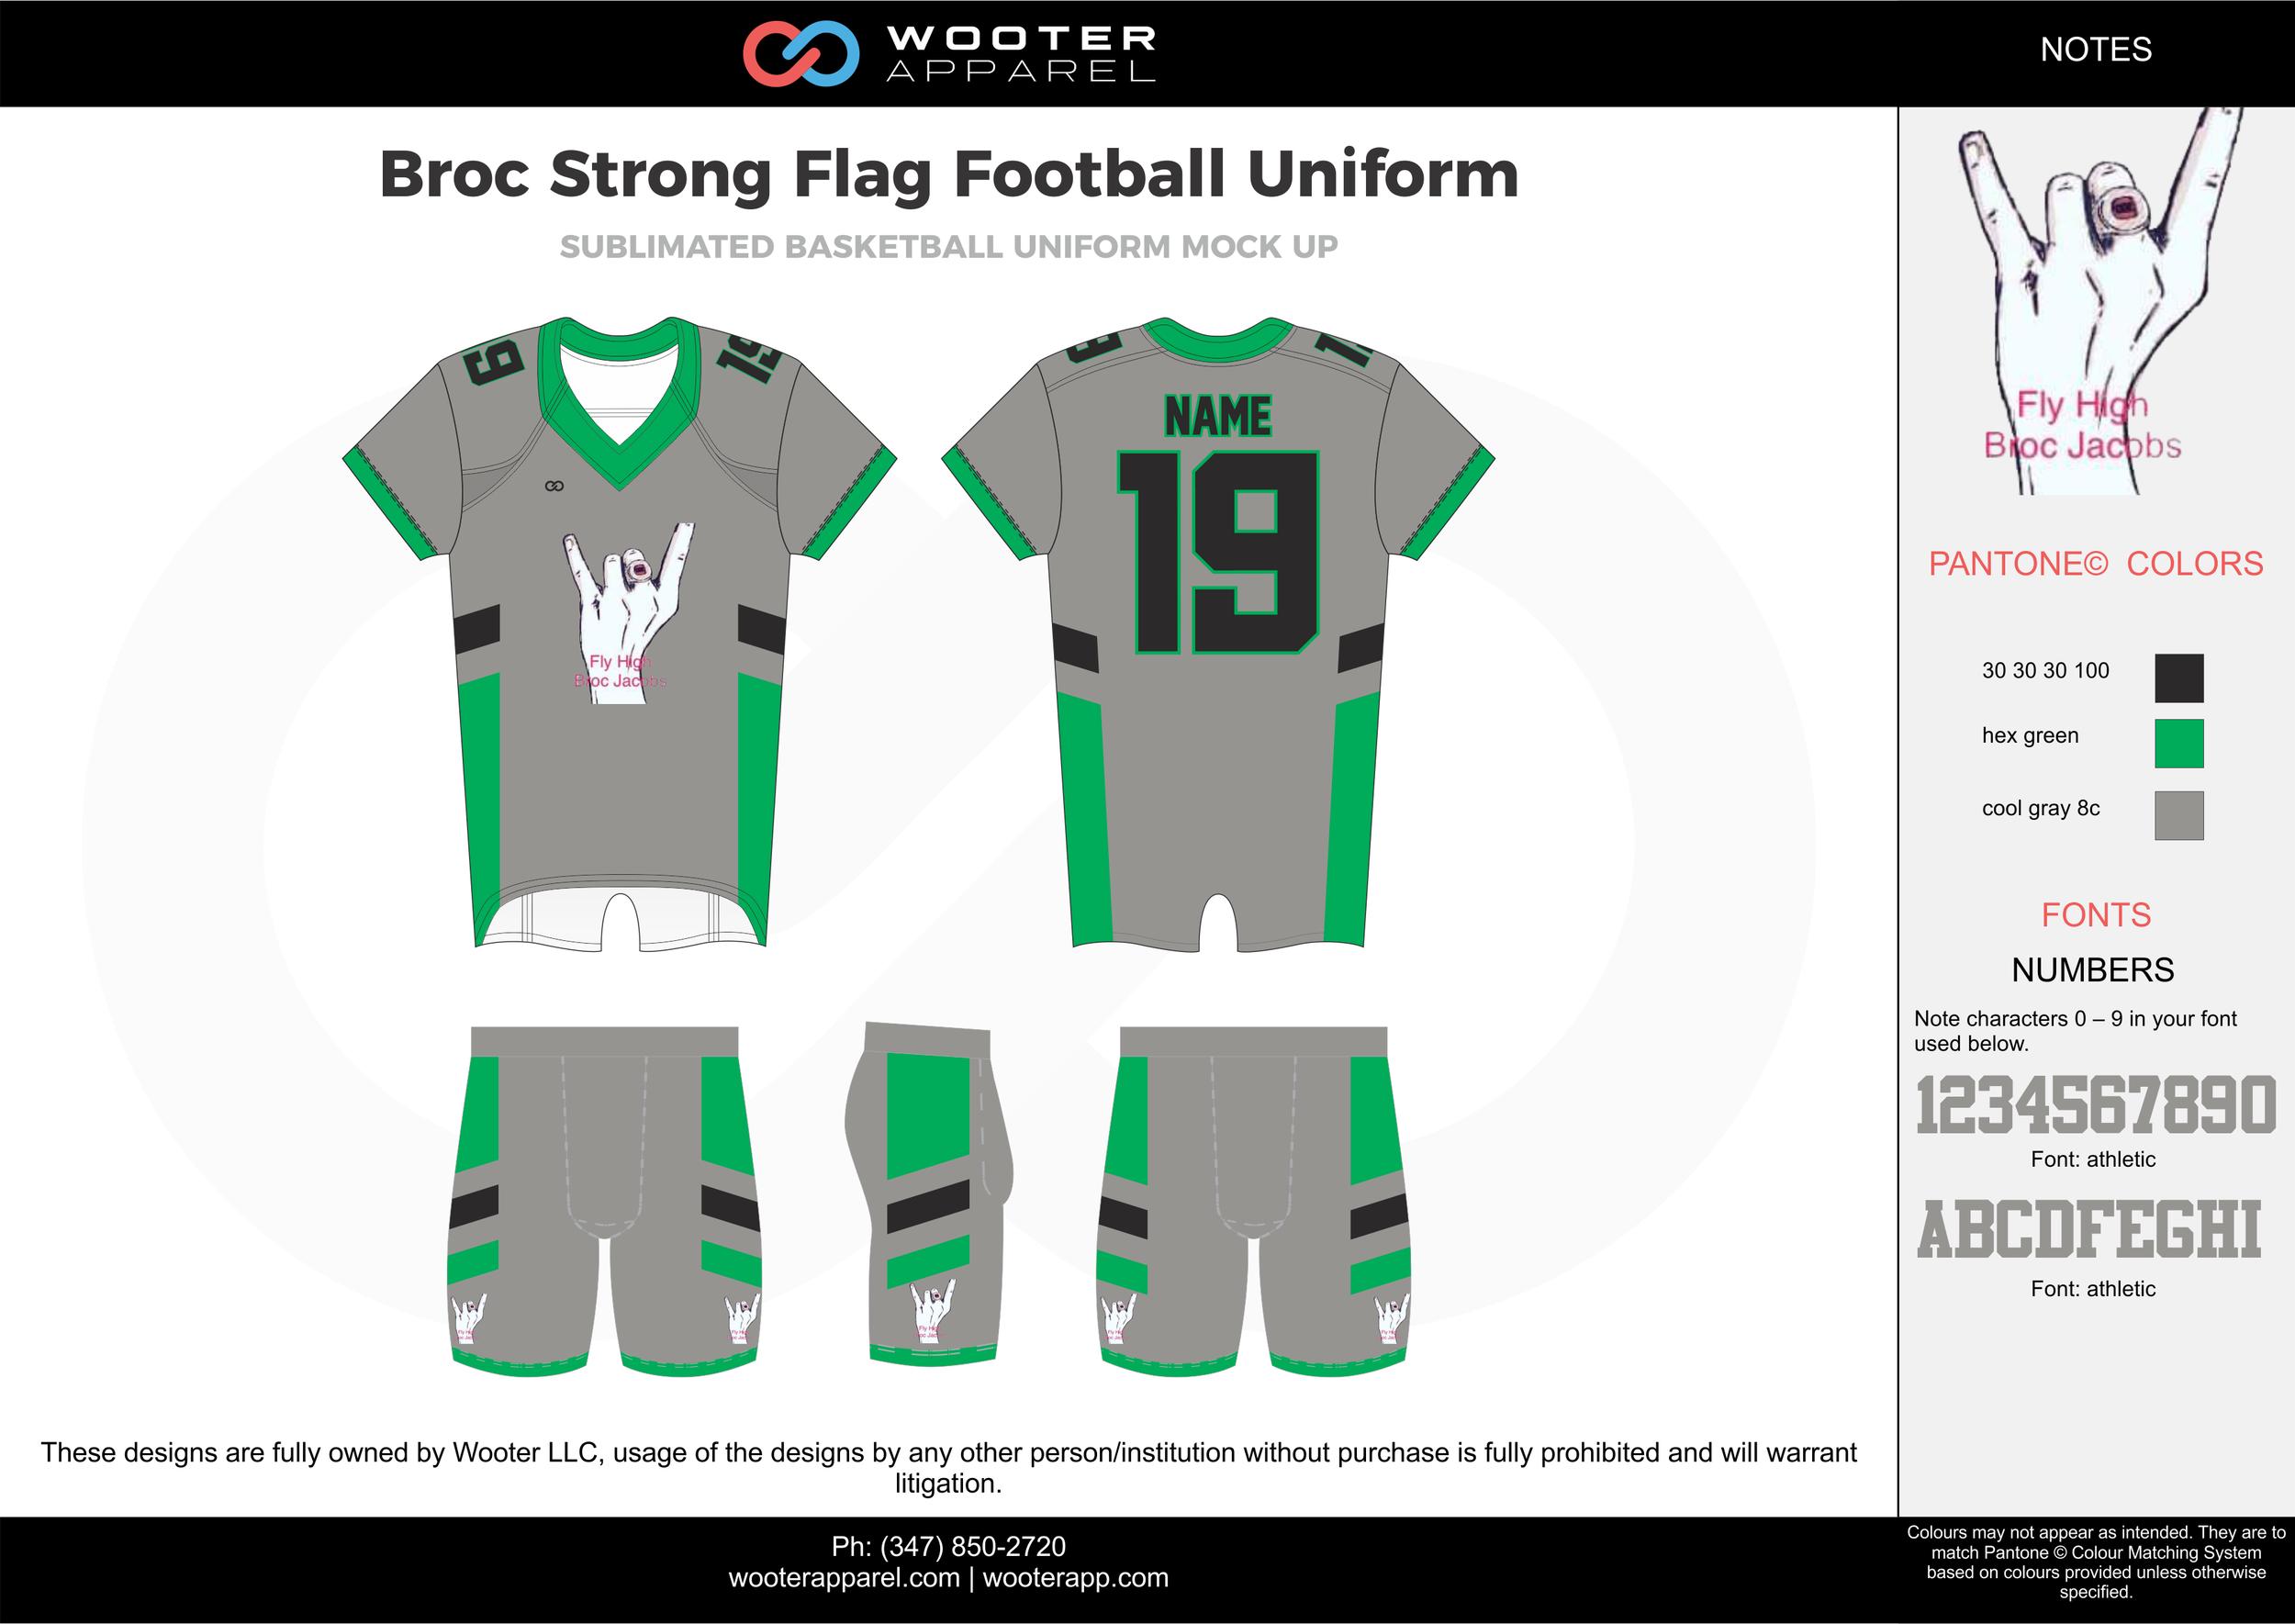 BROC STRONG green gray blue white flag football uniforms jerseys shorts